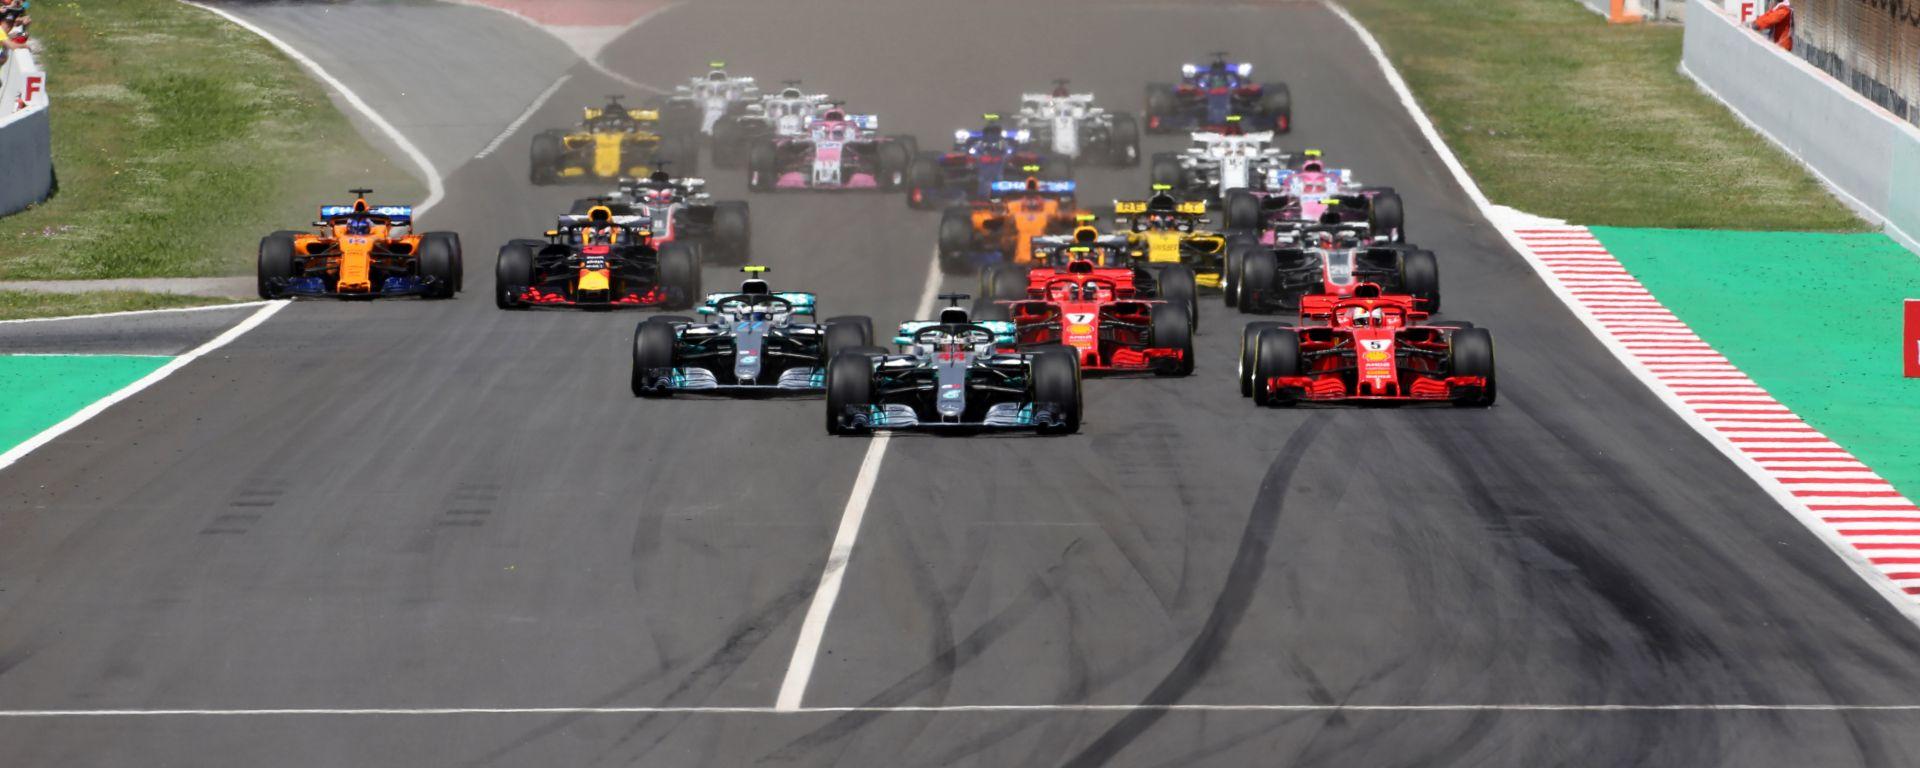 F1 GP Spagna 2018, la partenza